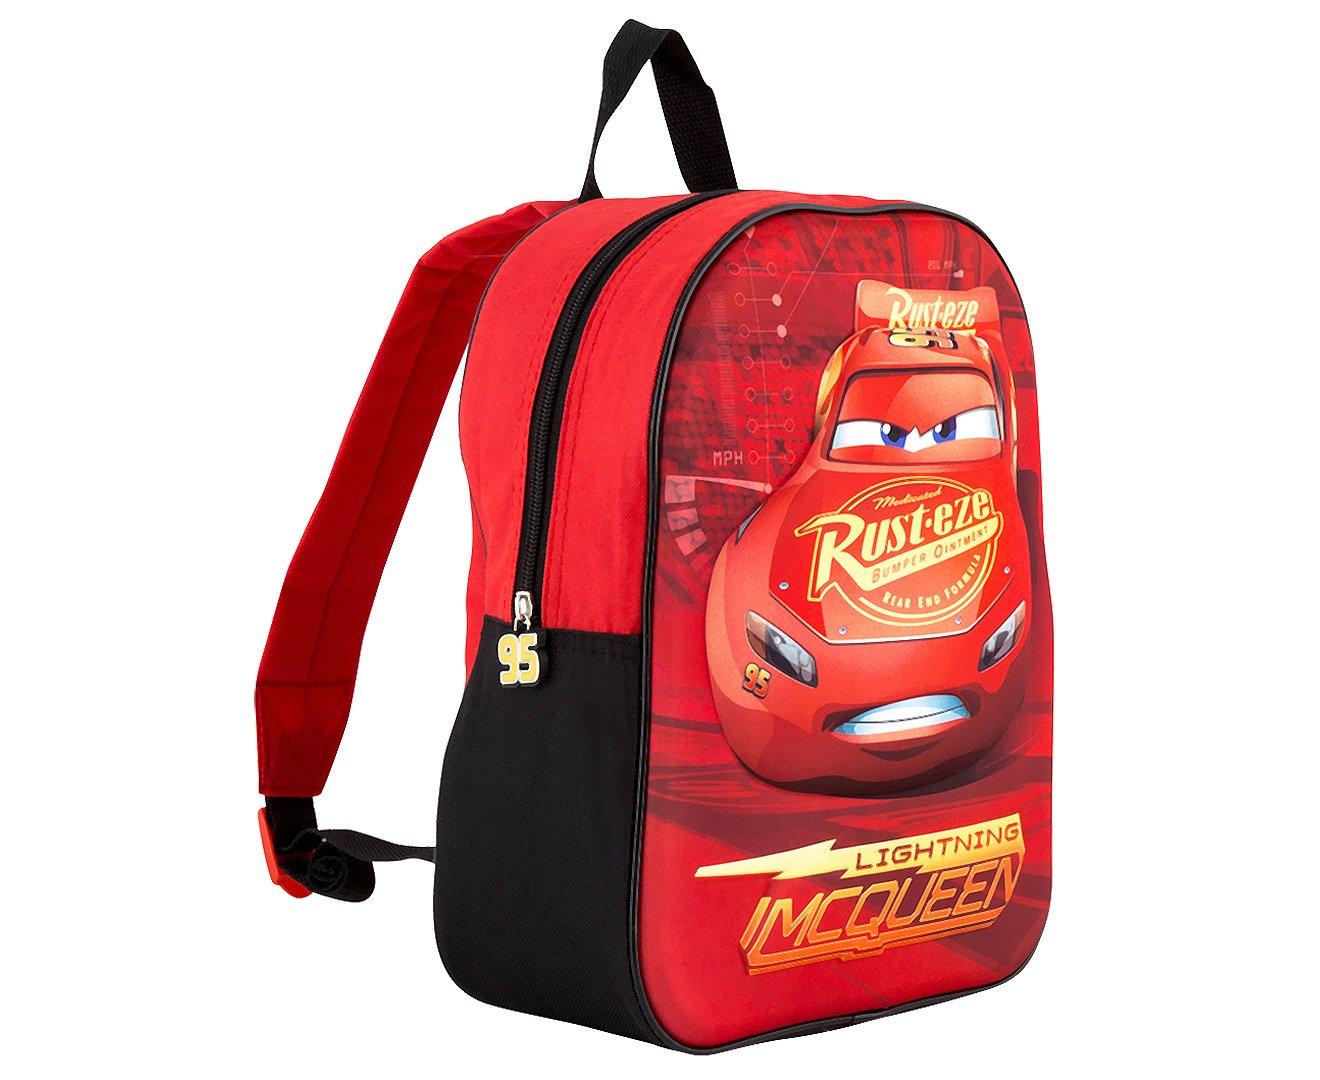 3D Effect Disney Lightning Mcqueen /'Piston Cup Champion/' Cars Kids Backpack